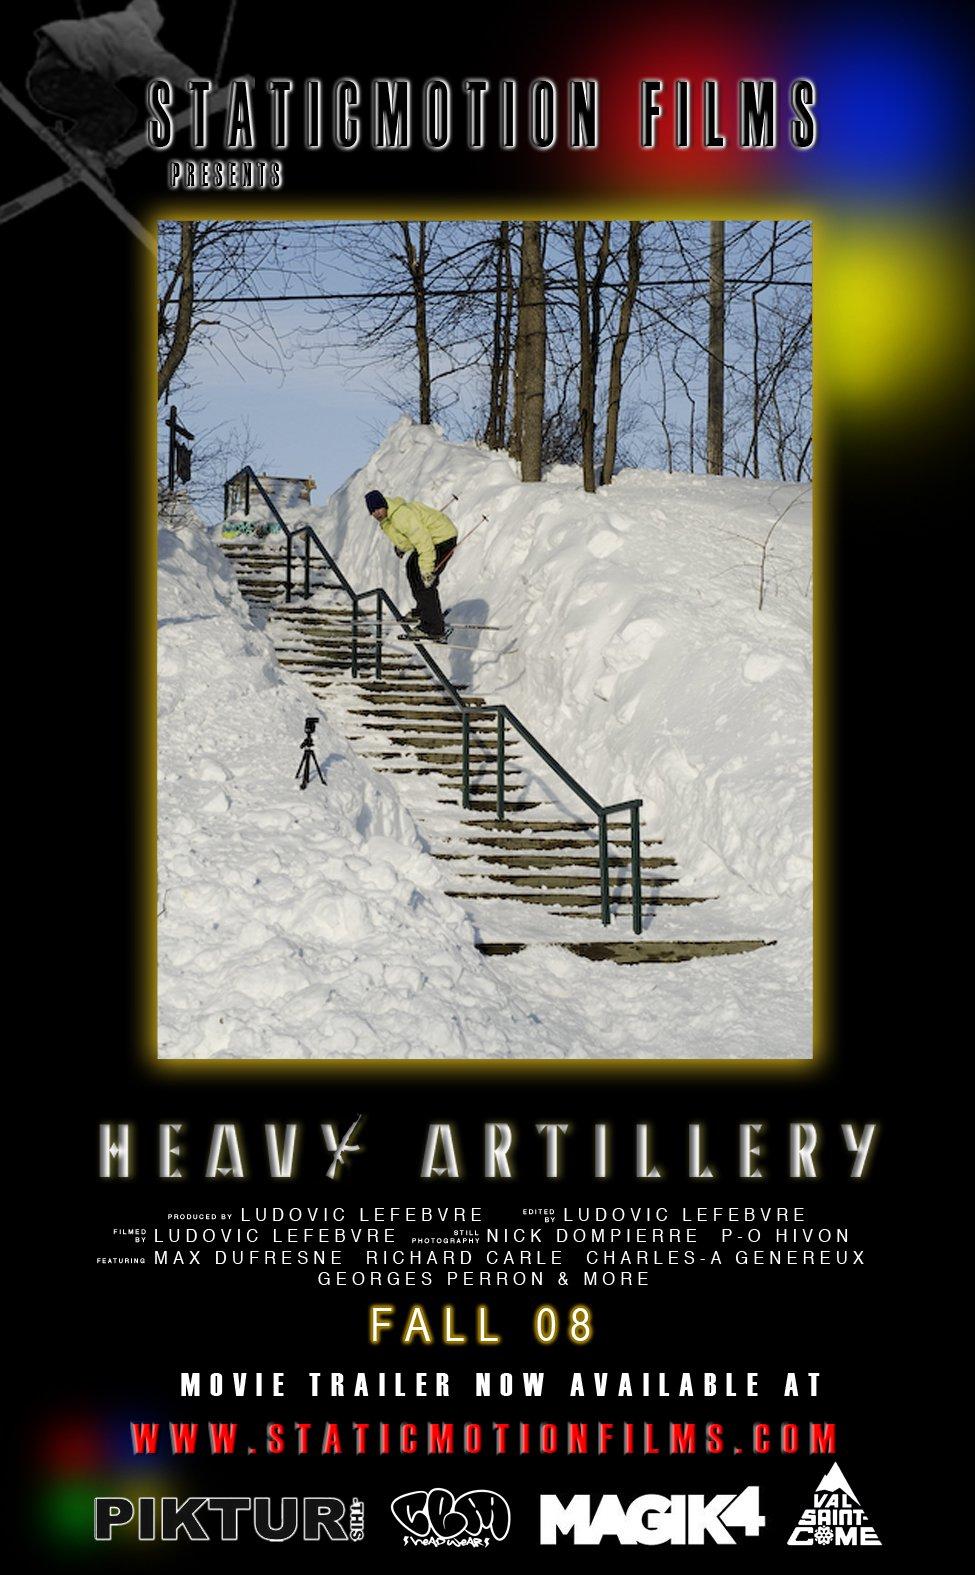 Staticmotion films - Heavy Artillery teaser - 1 of 2